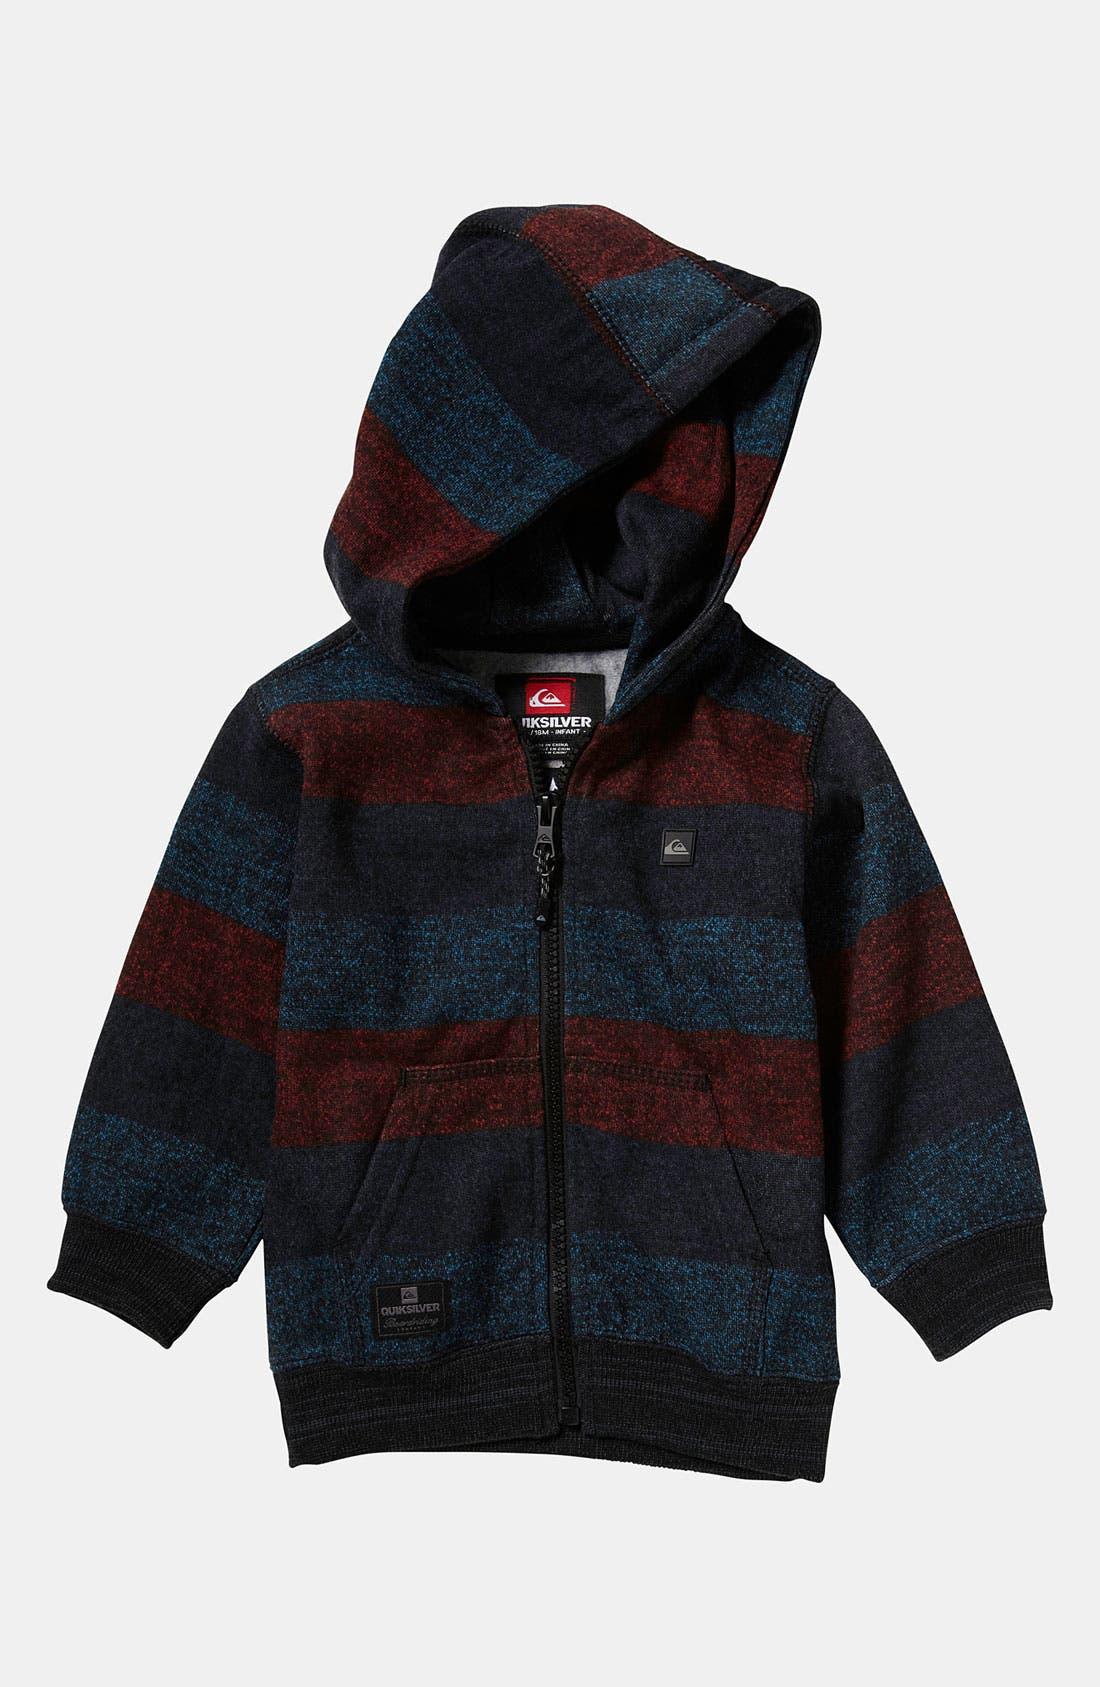 Main Image - Quiksilver 'Redondo' Stripe Hoodie (Infant)